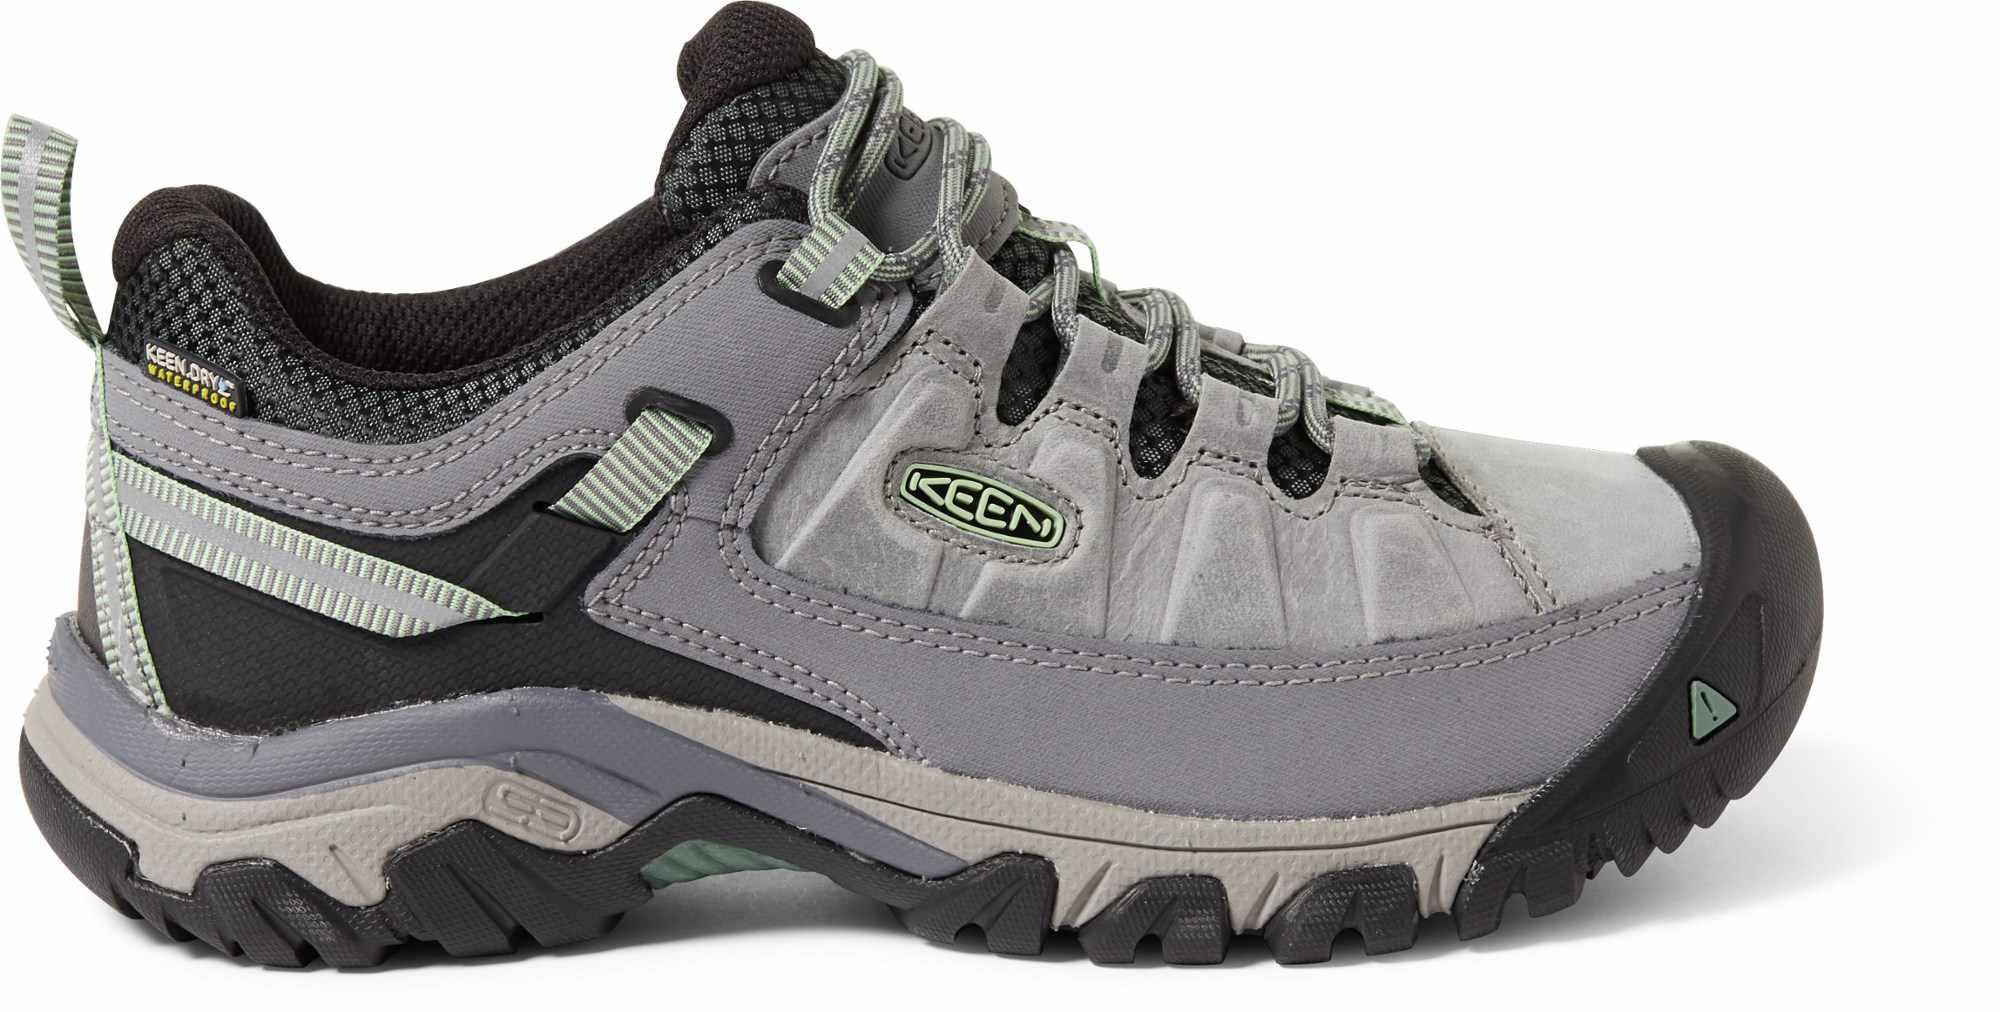 KEEN Women's Targhee III Waterproof Hiking Shoes